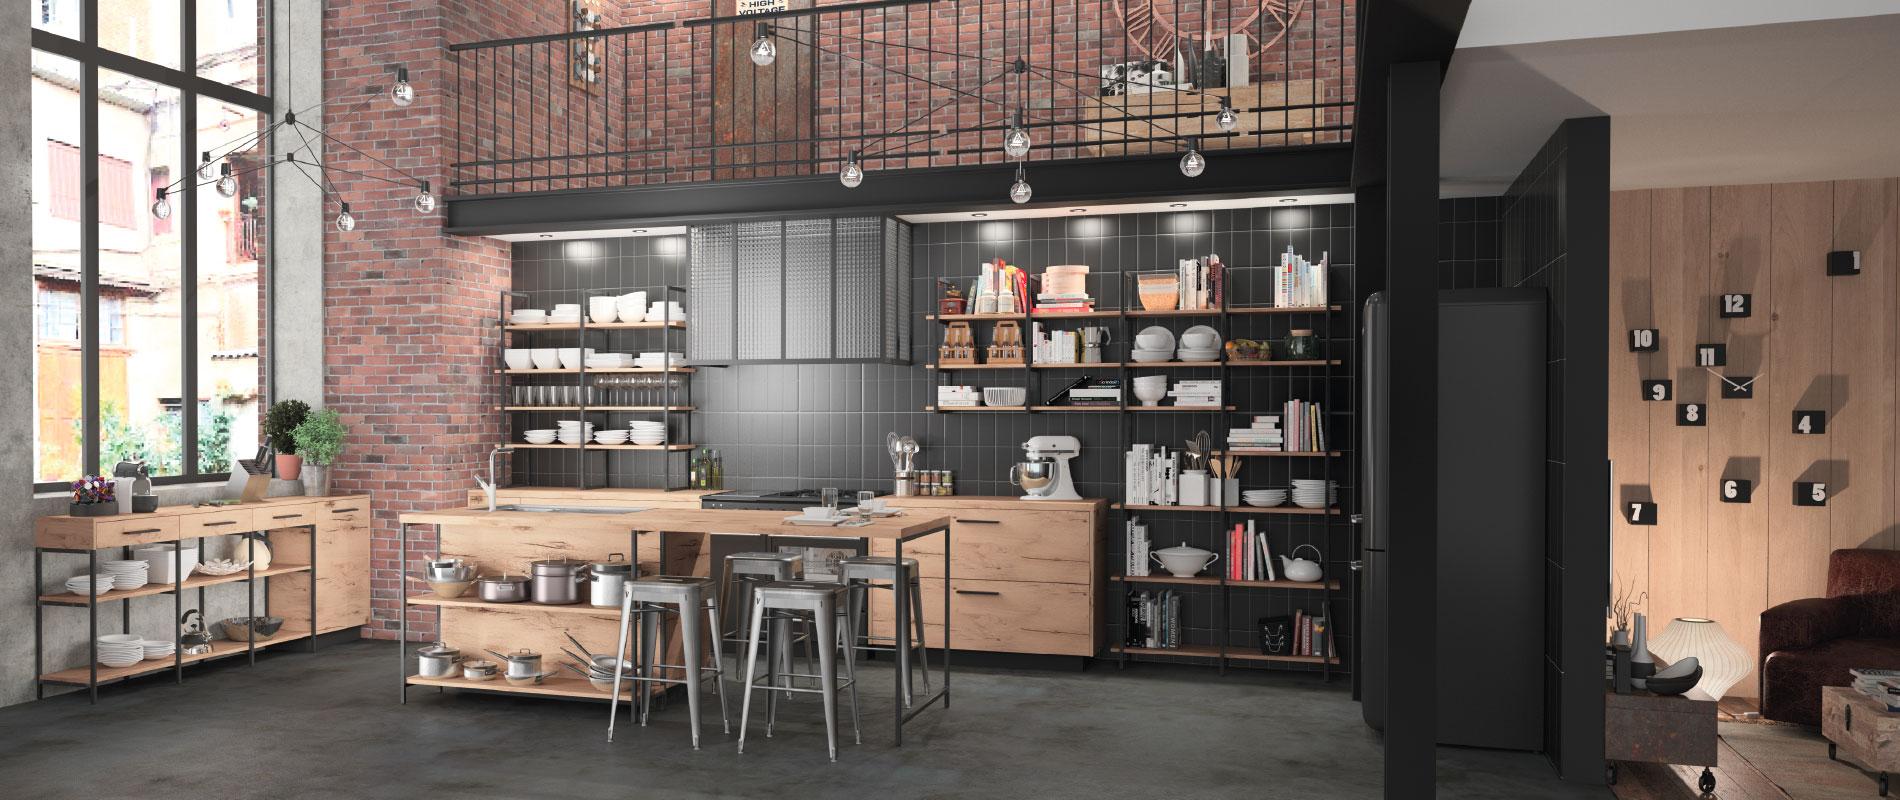 dineries cuisines et bain entreprise cr en 1980 m. Black Bedroom Furniture Sets. Home Design Ideas